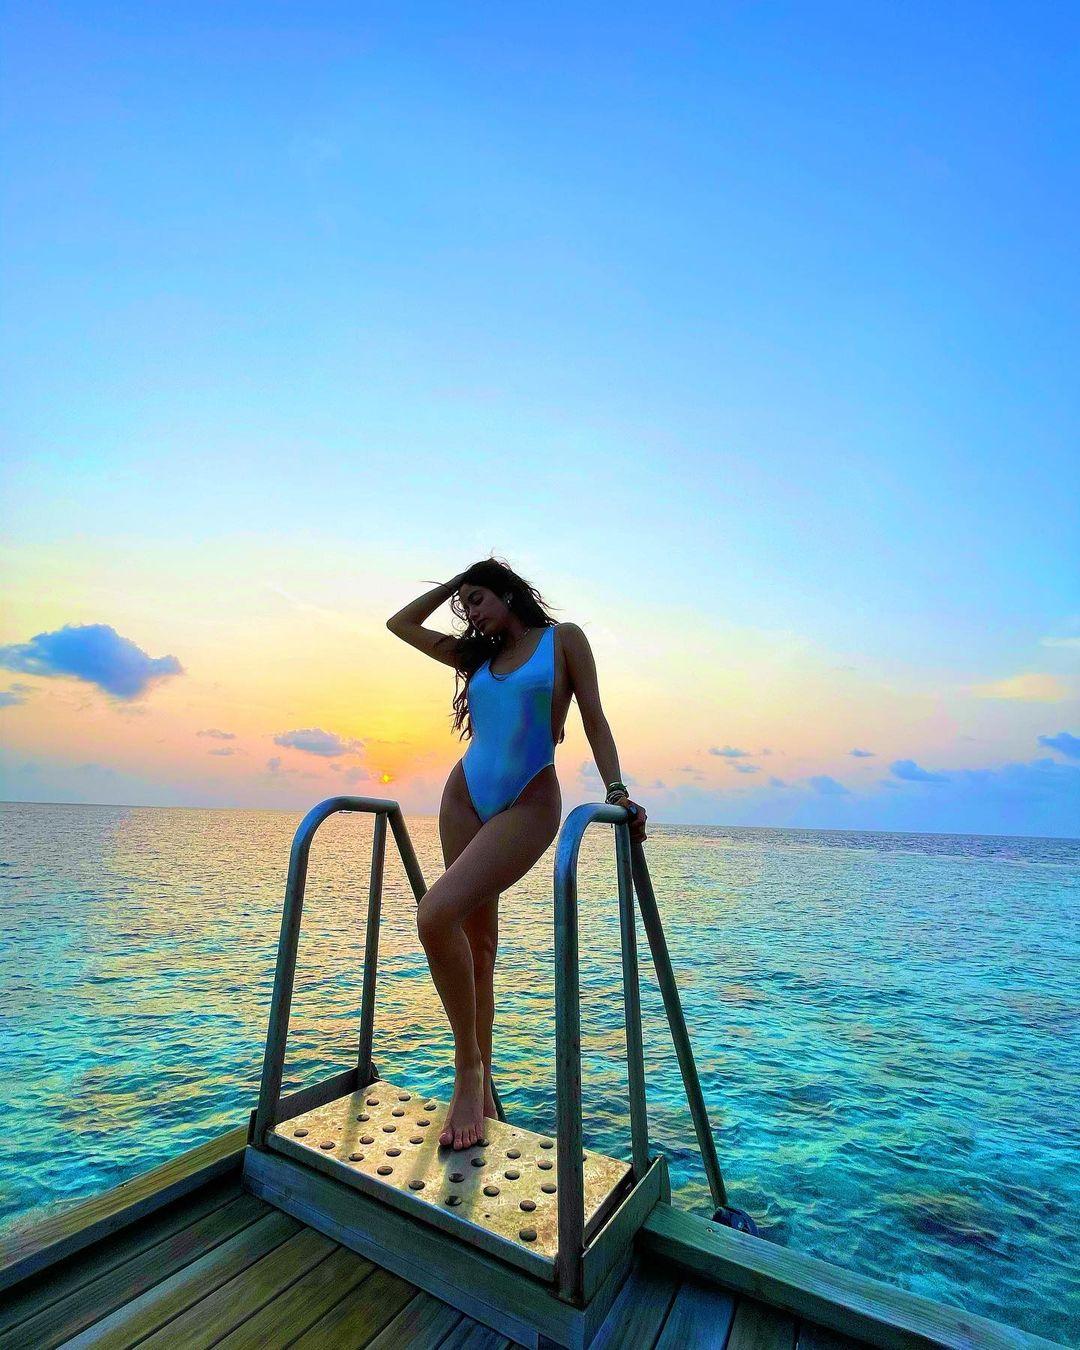 janhvi kapoor in maldives